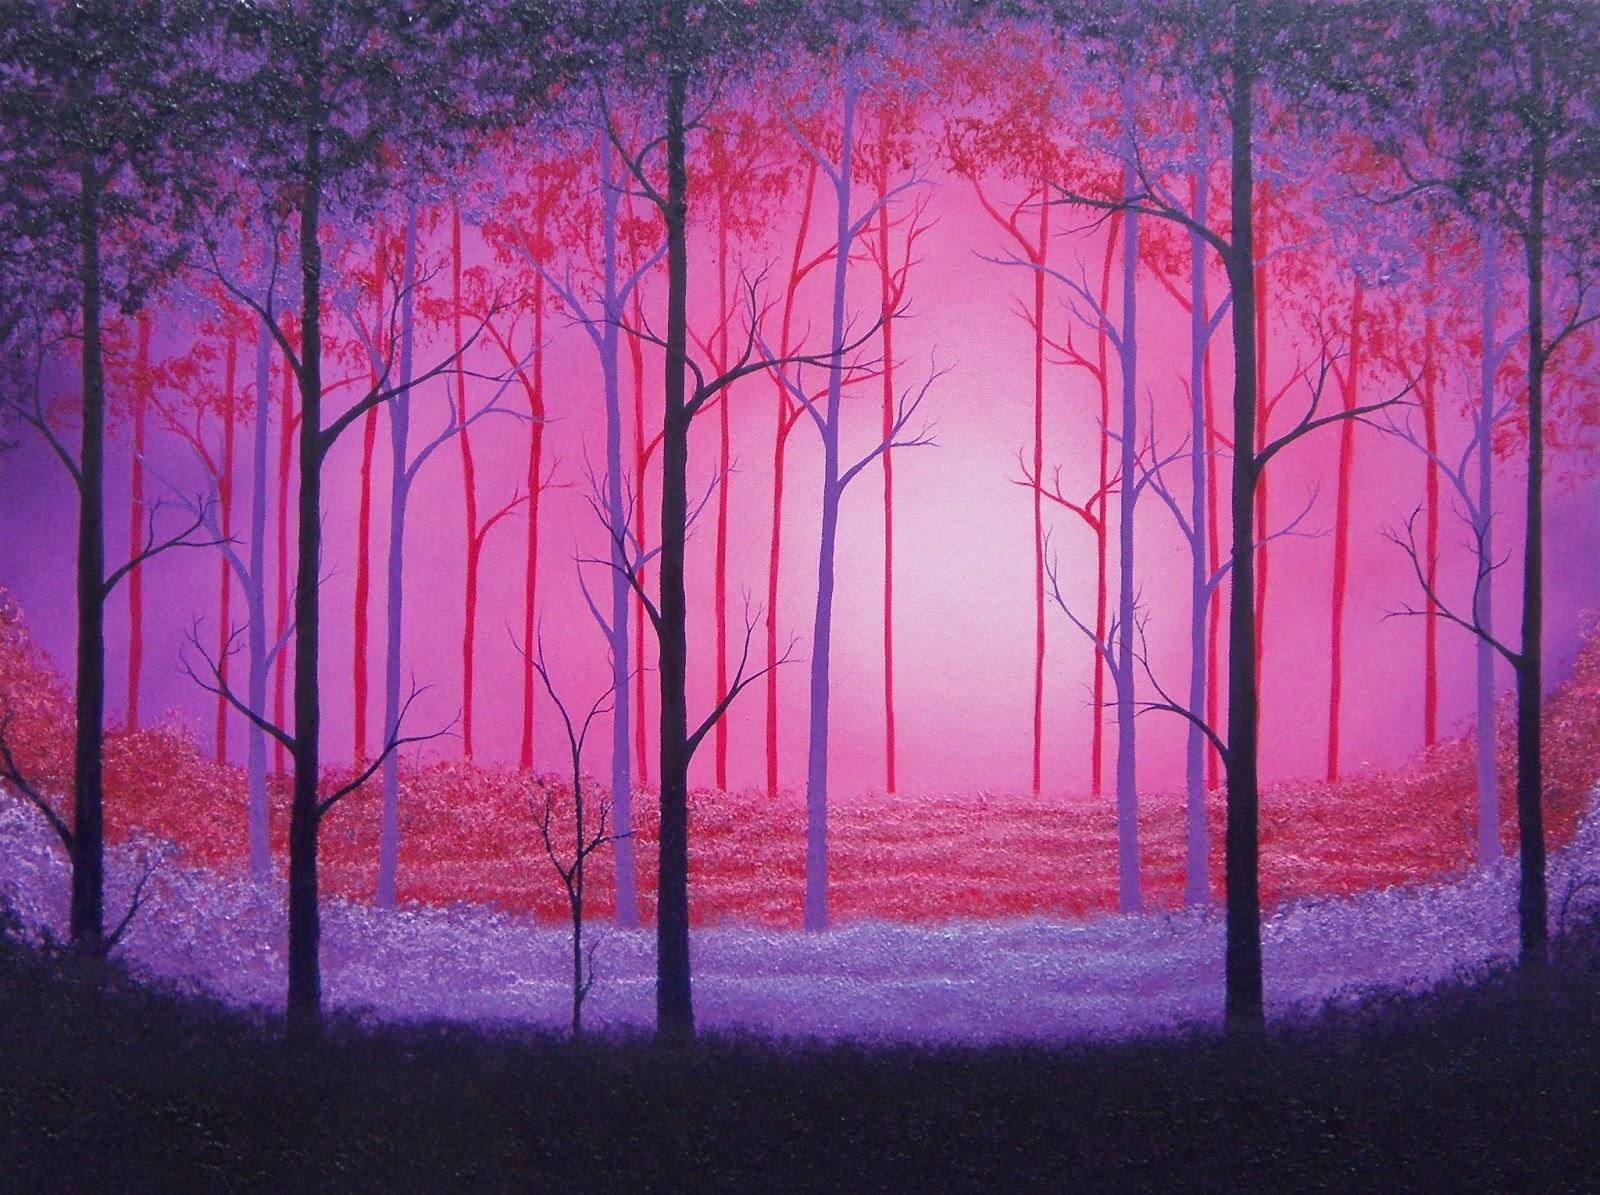 Dark Art Foggy Forest Oil Painting Surreal Of Purple Trees 18 X 24 Original